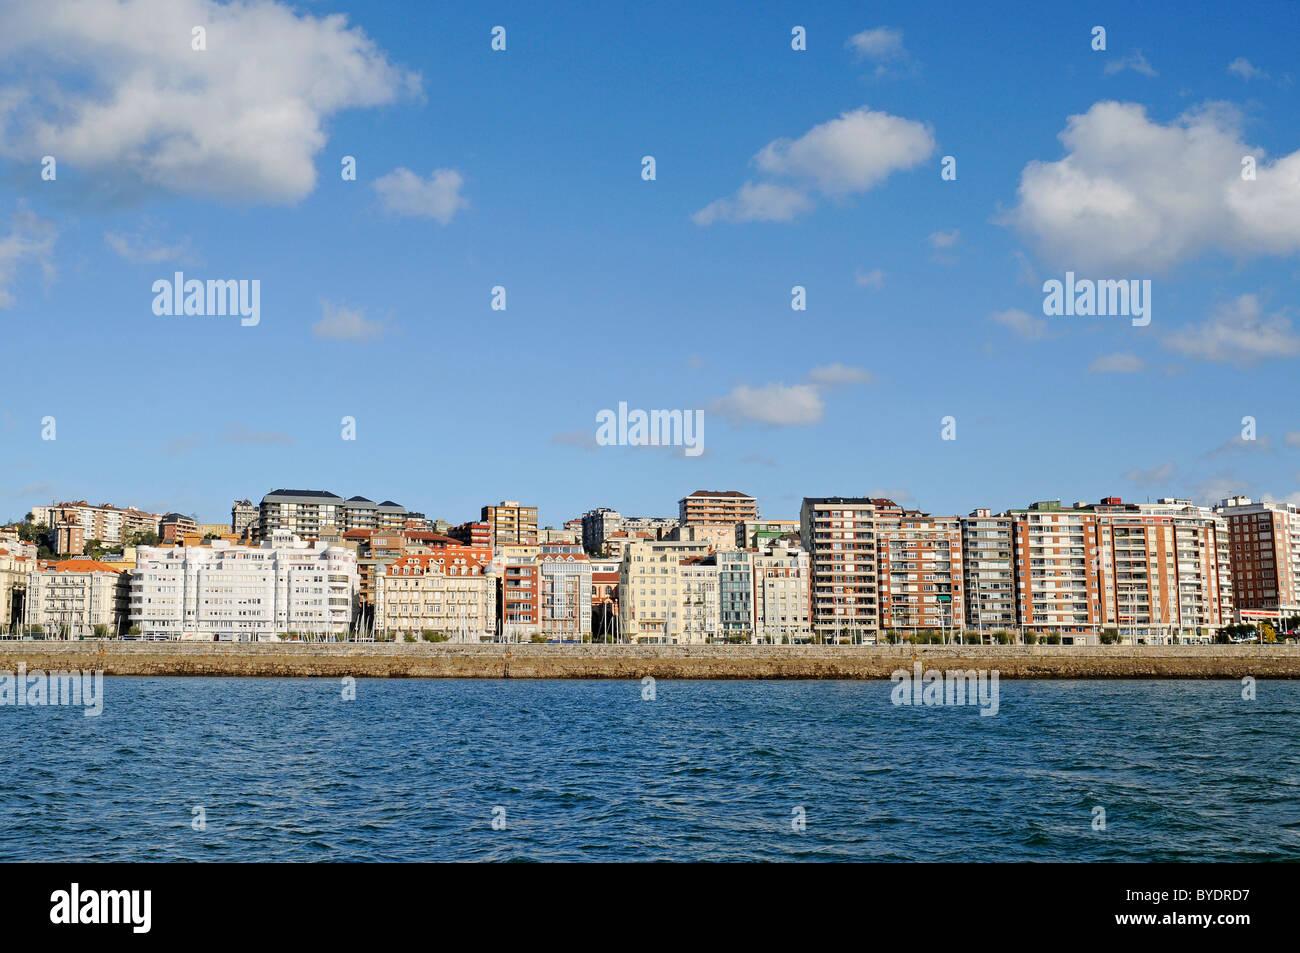 Coastal development, waterfront, Santander, Cantabria, Spain, Europe - Stock Image